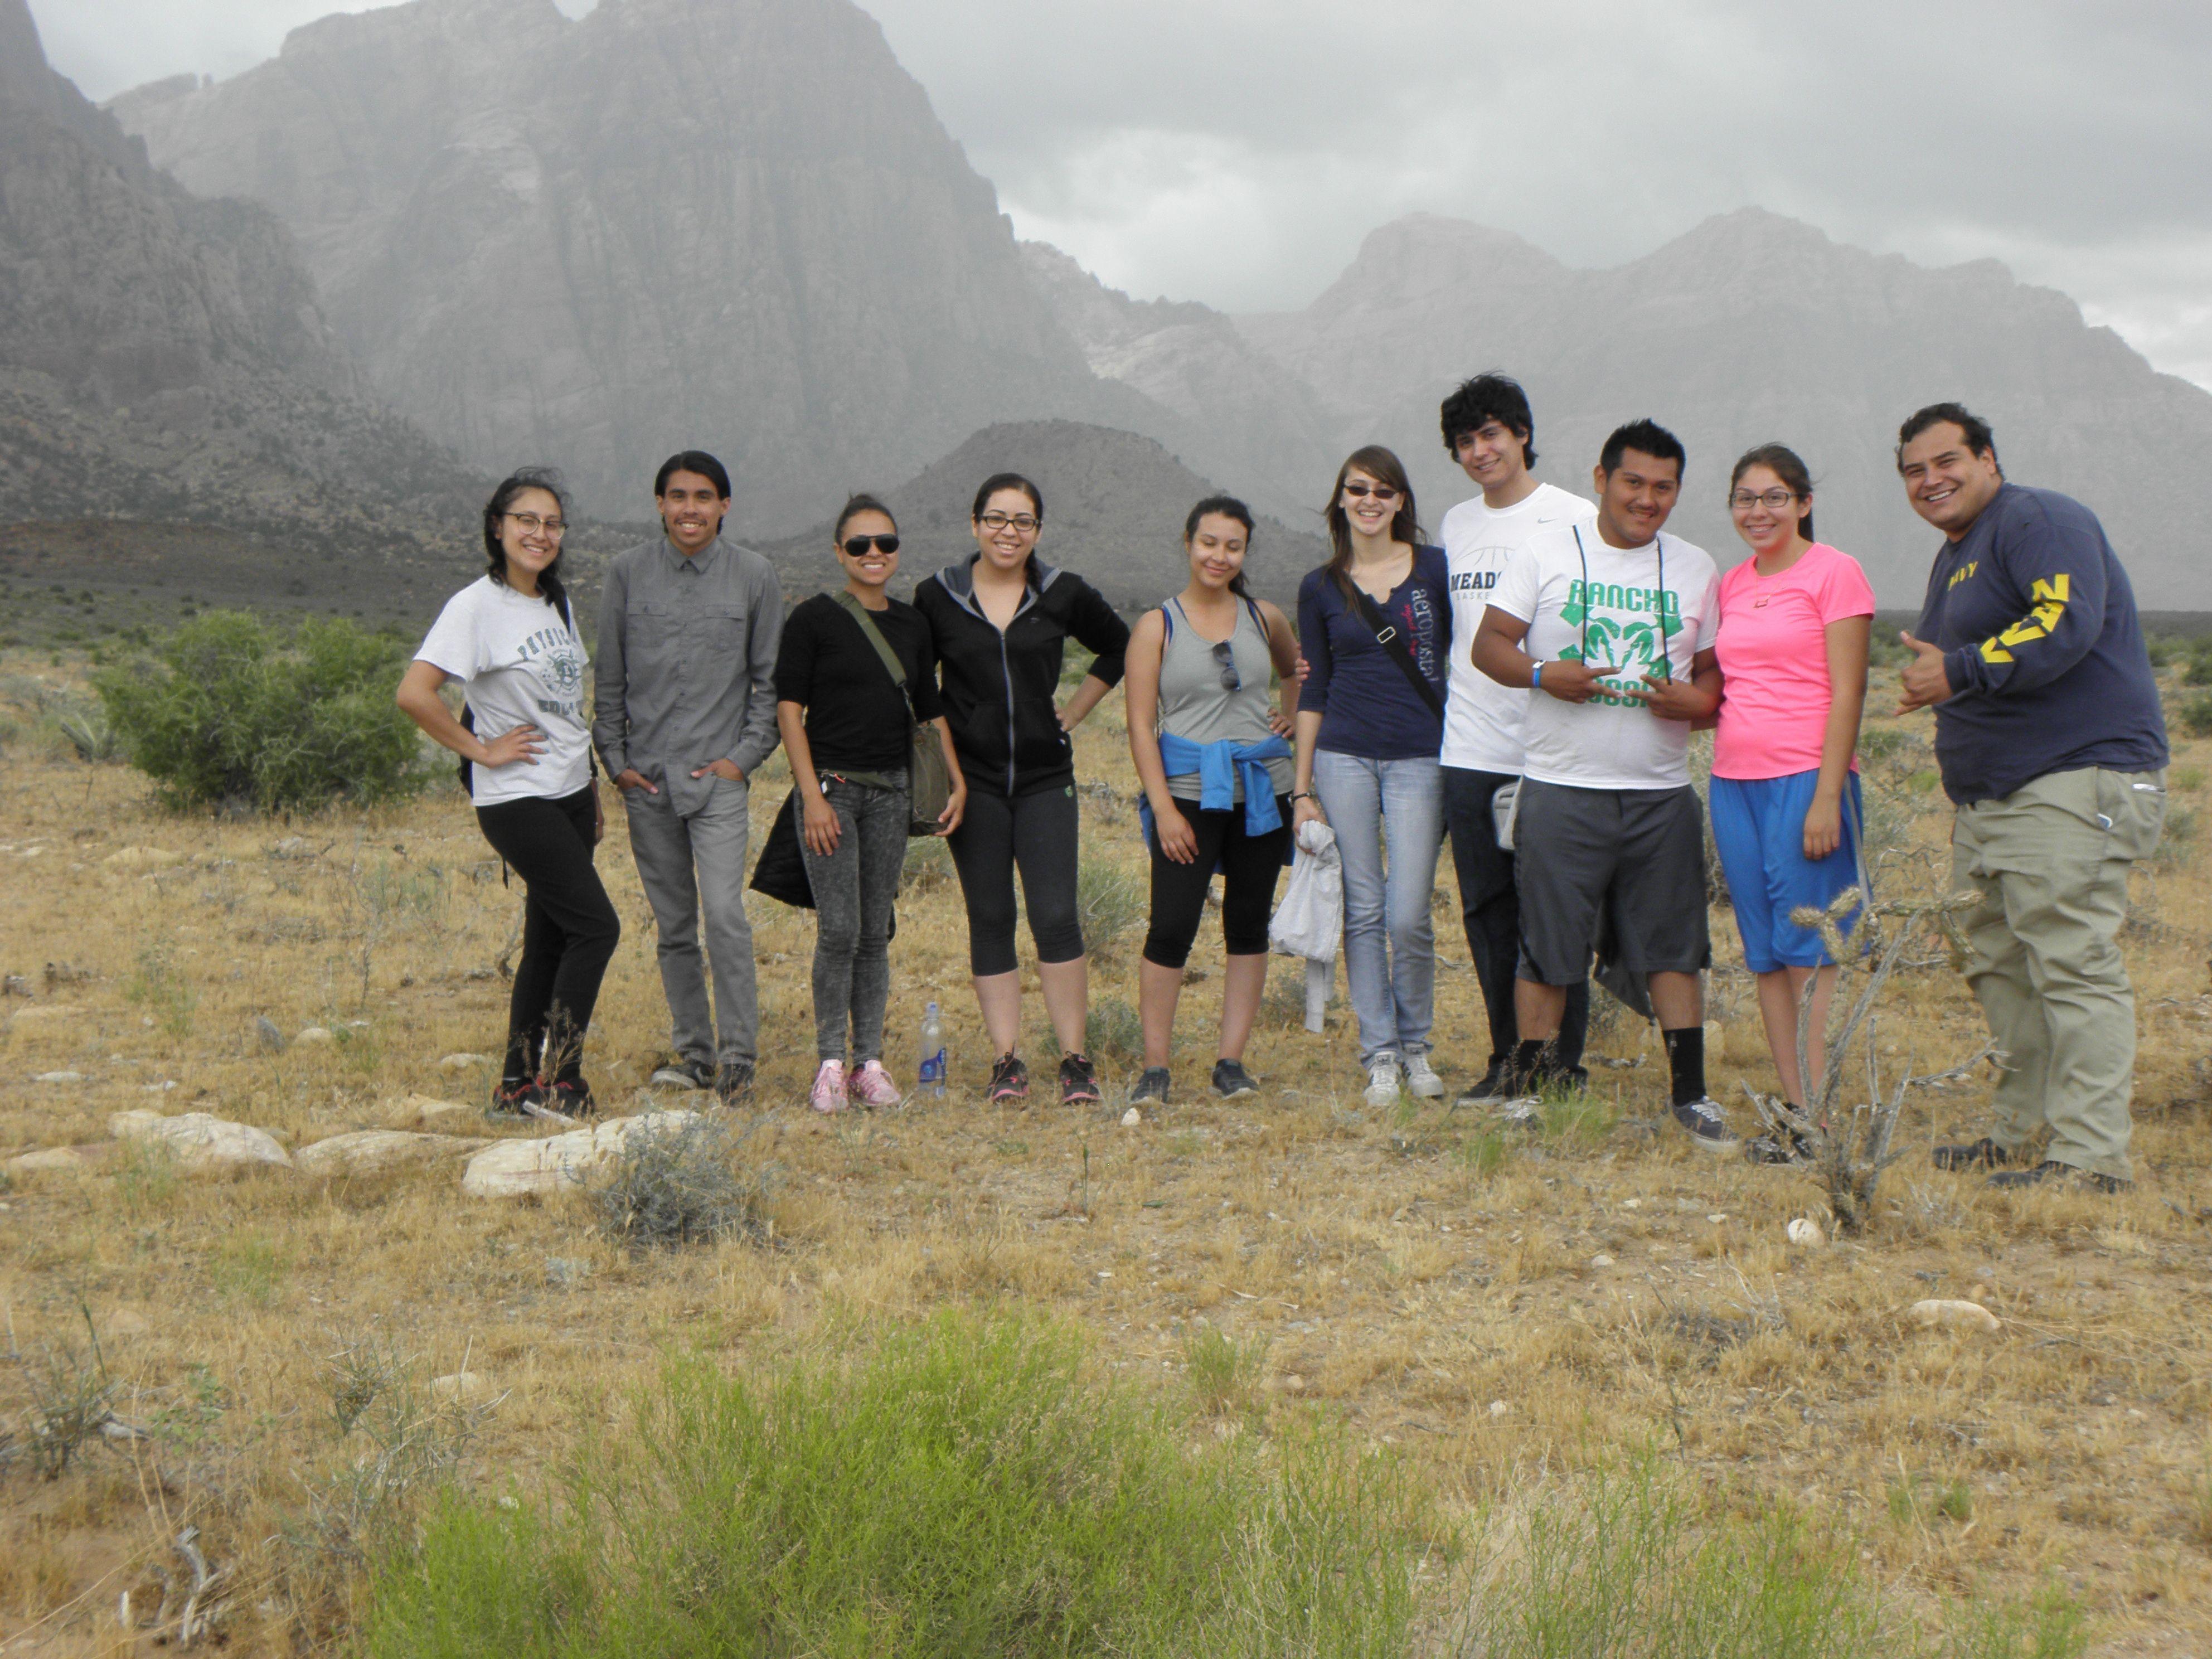 Sierra Club Southern Nevada Group